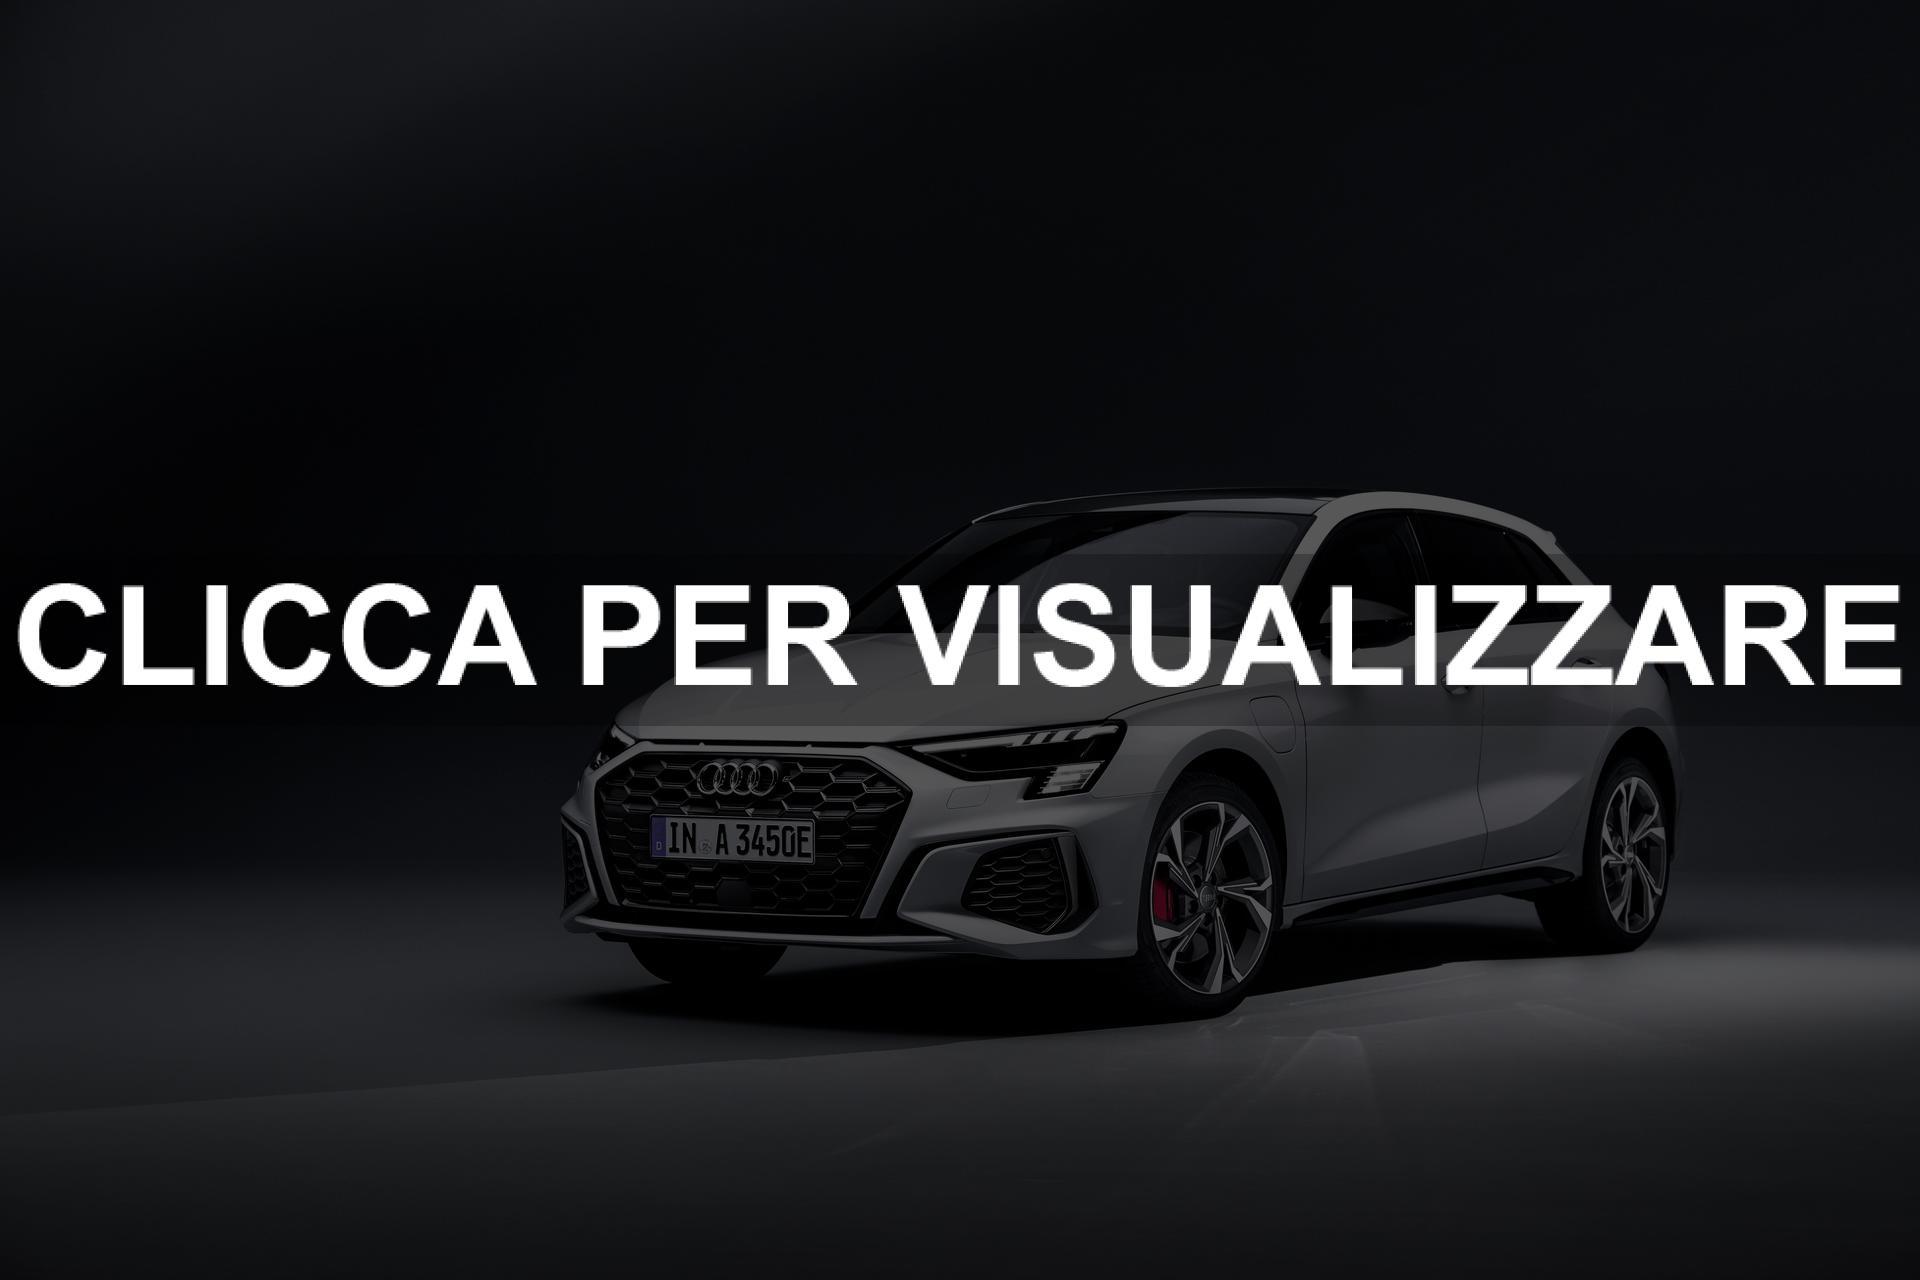 Nuova Audi A3 Sportback 45 TFSI Ibrida plug in 2021